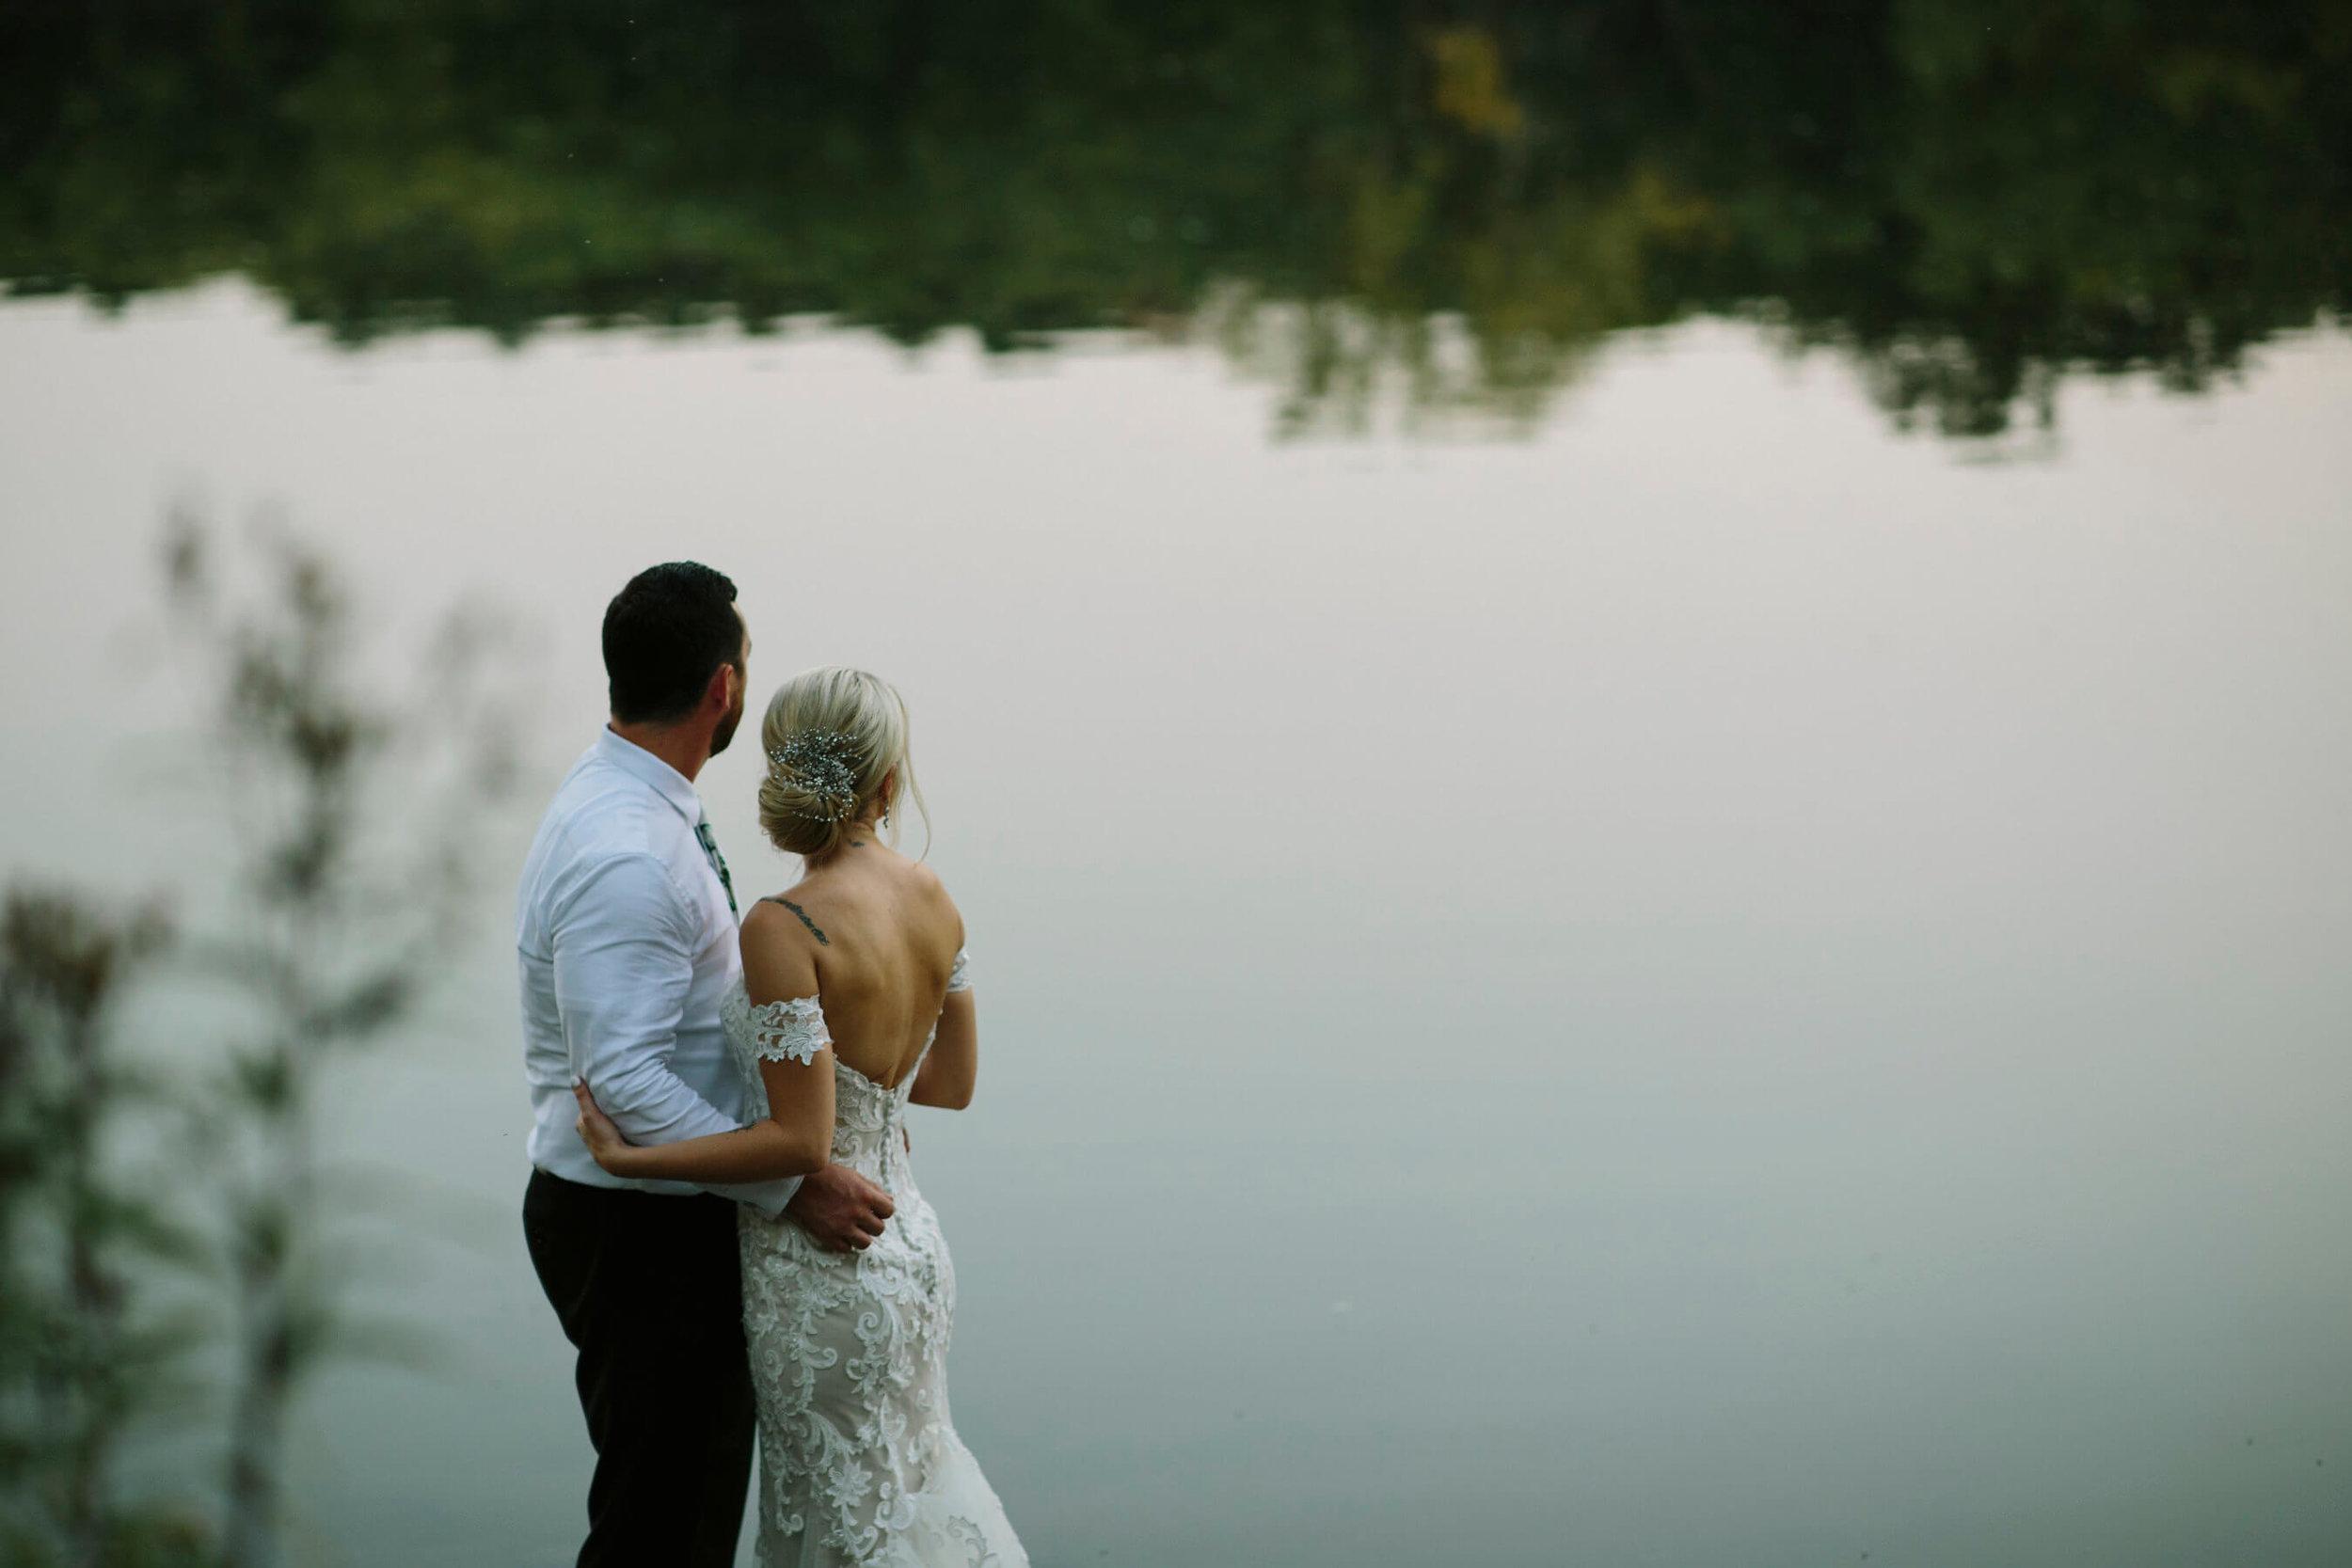 engle-olson-april-cj-wedding-jessica-holleque-17.jpg